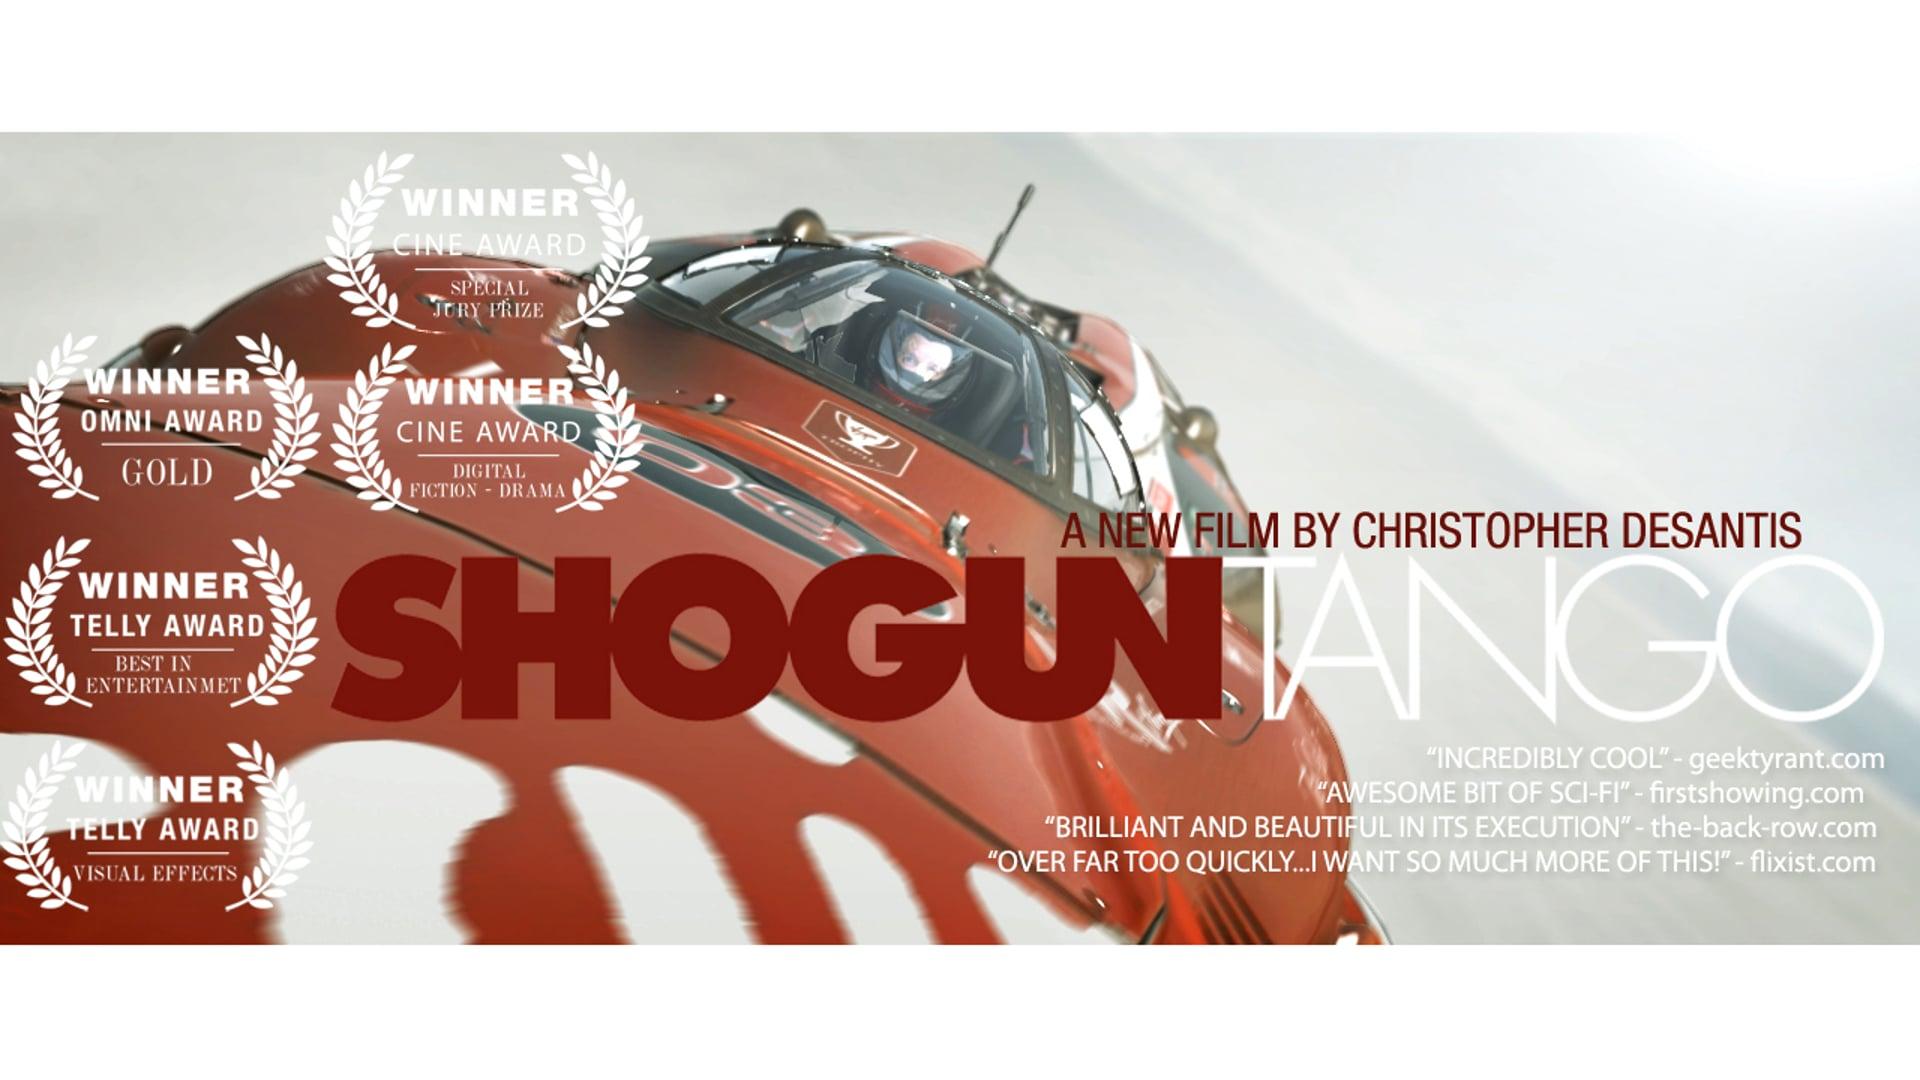 SHOGUN TANGO